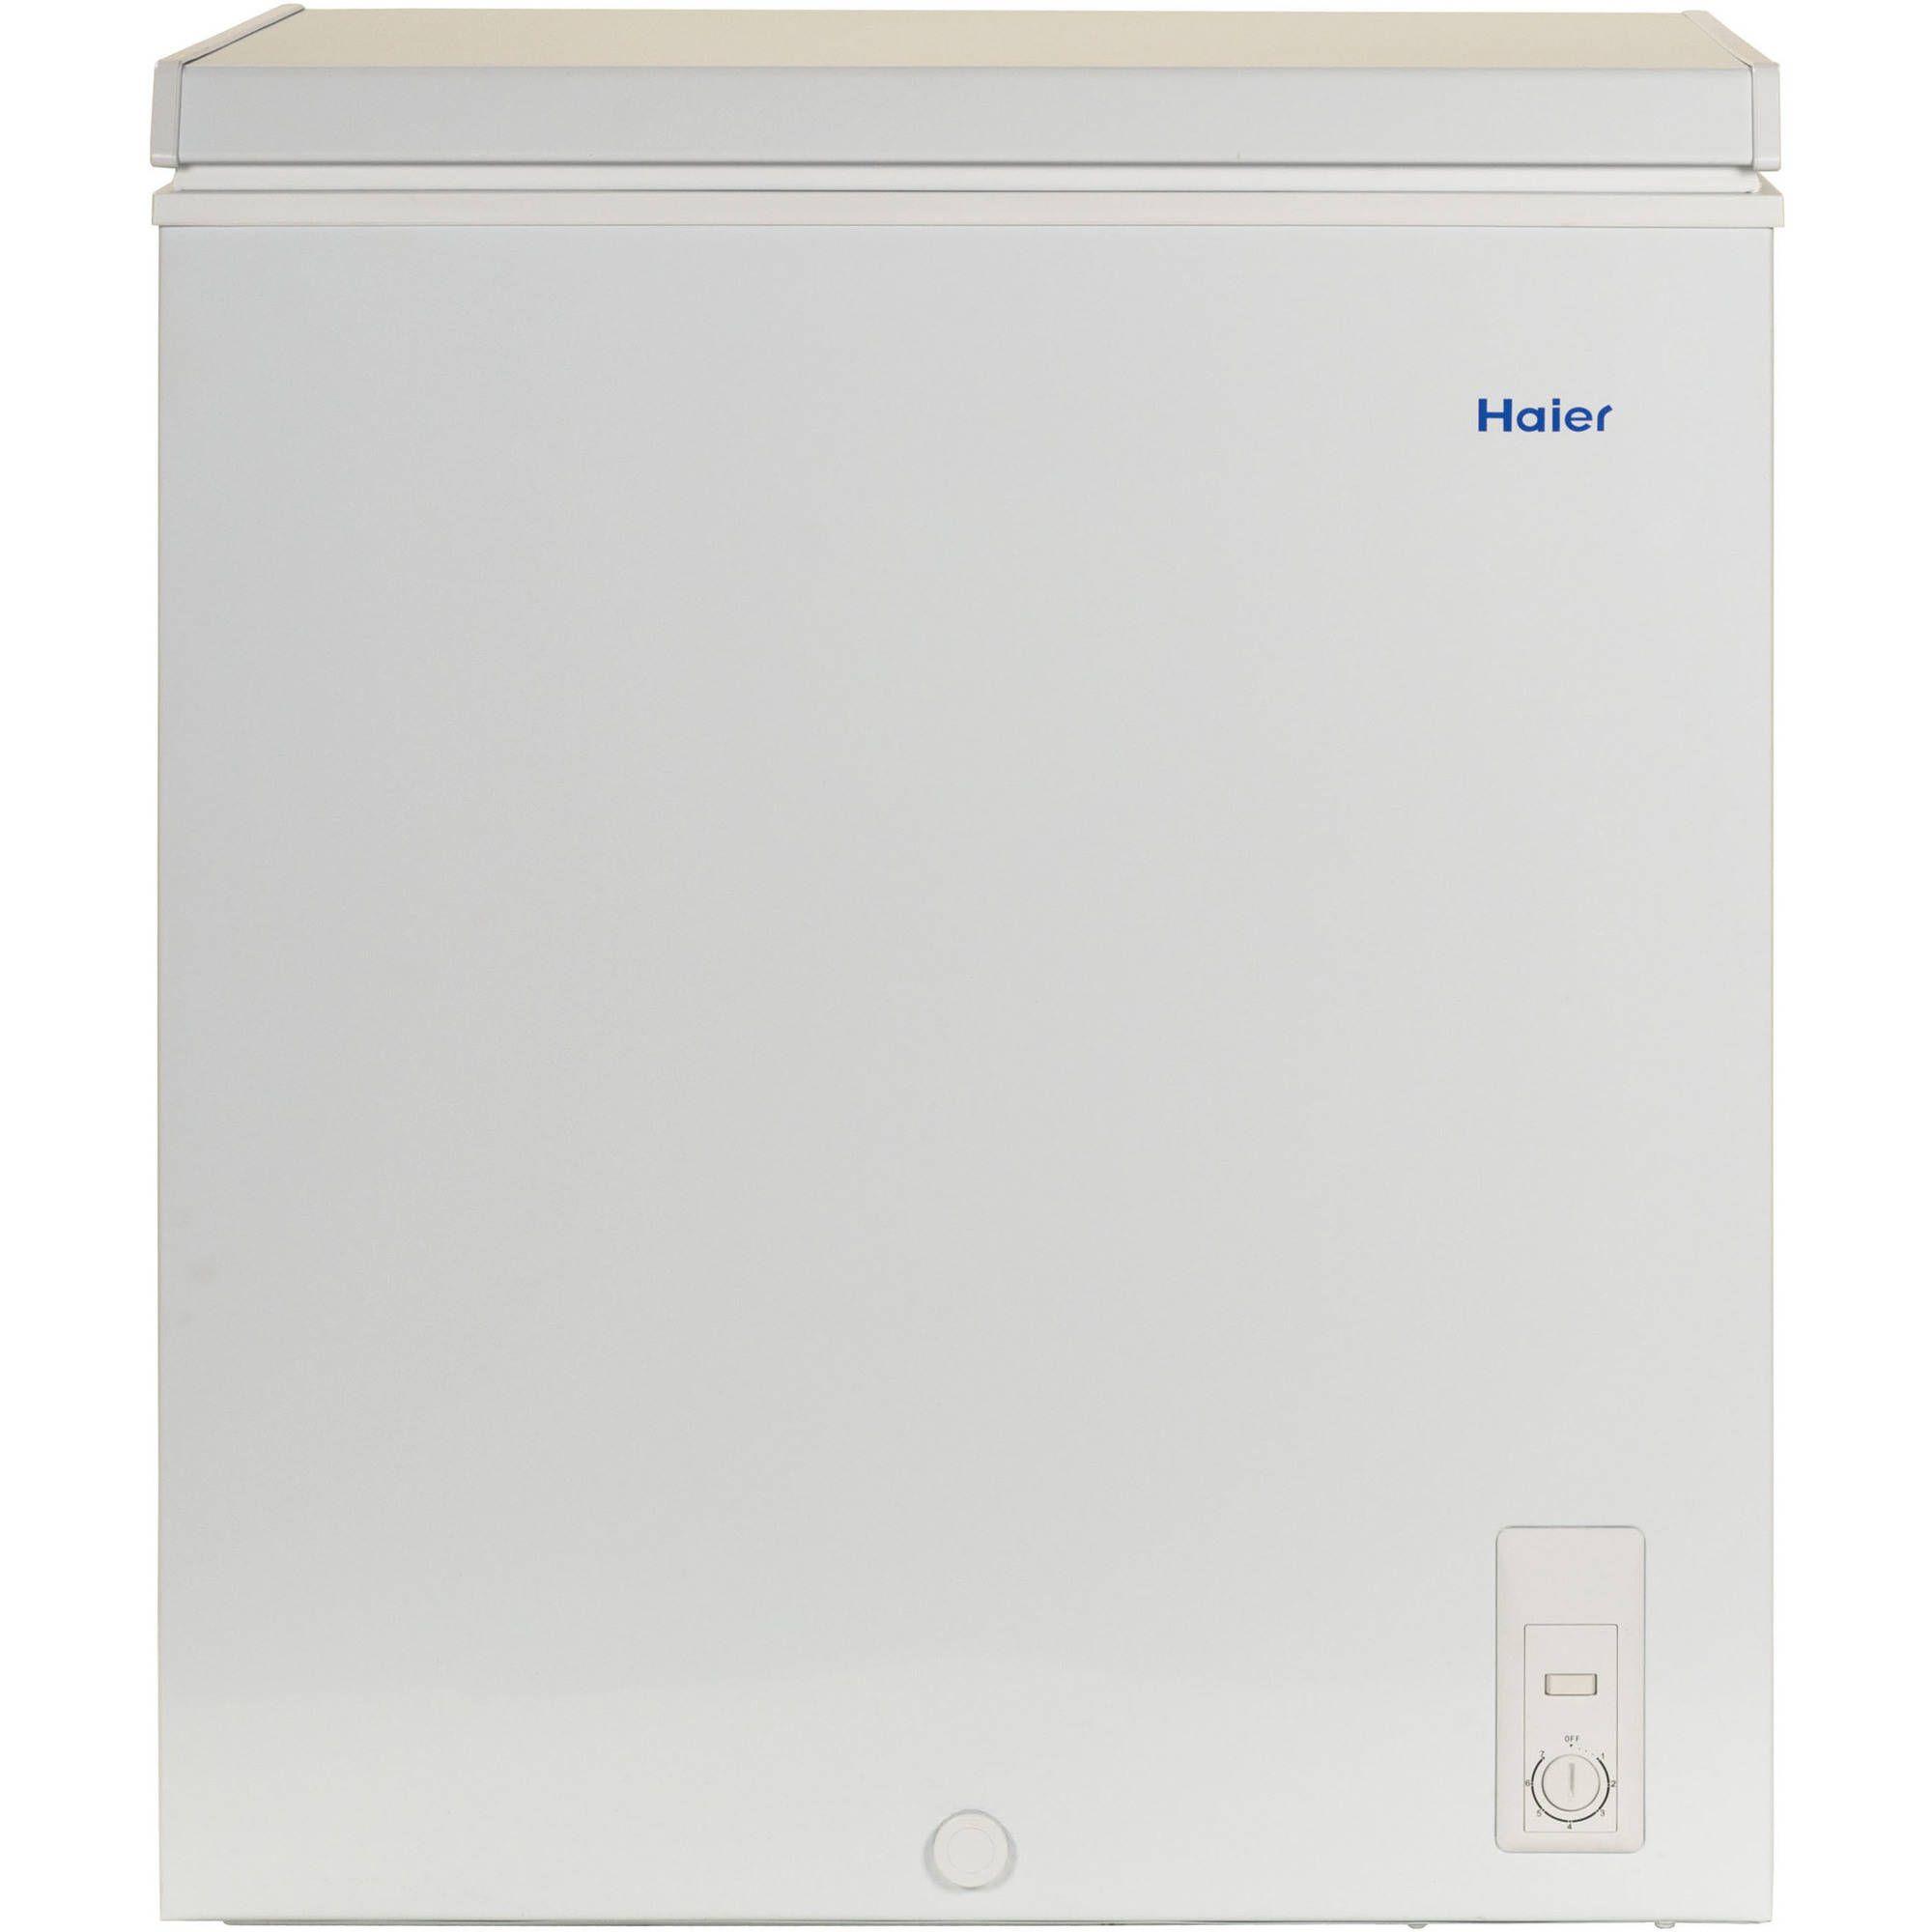 Best Budget Chest Haier 5 0 Cu Ft Capacity Freezer